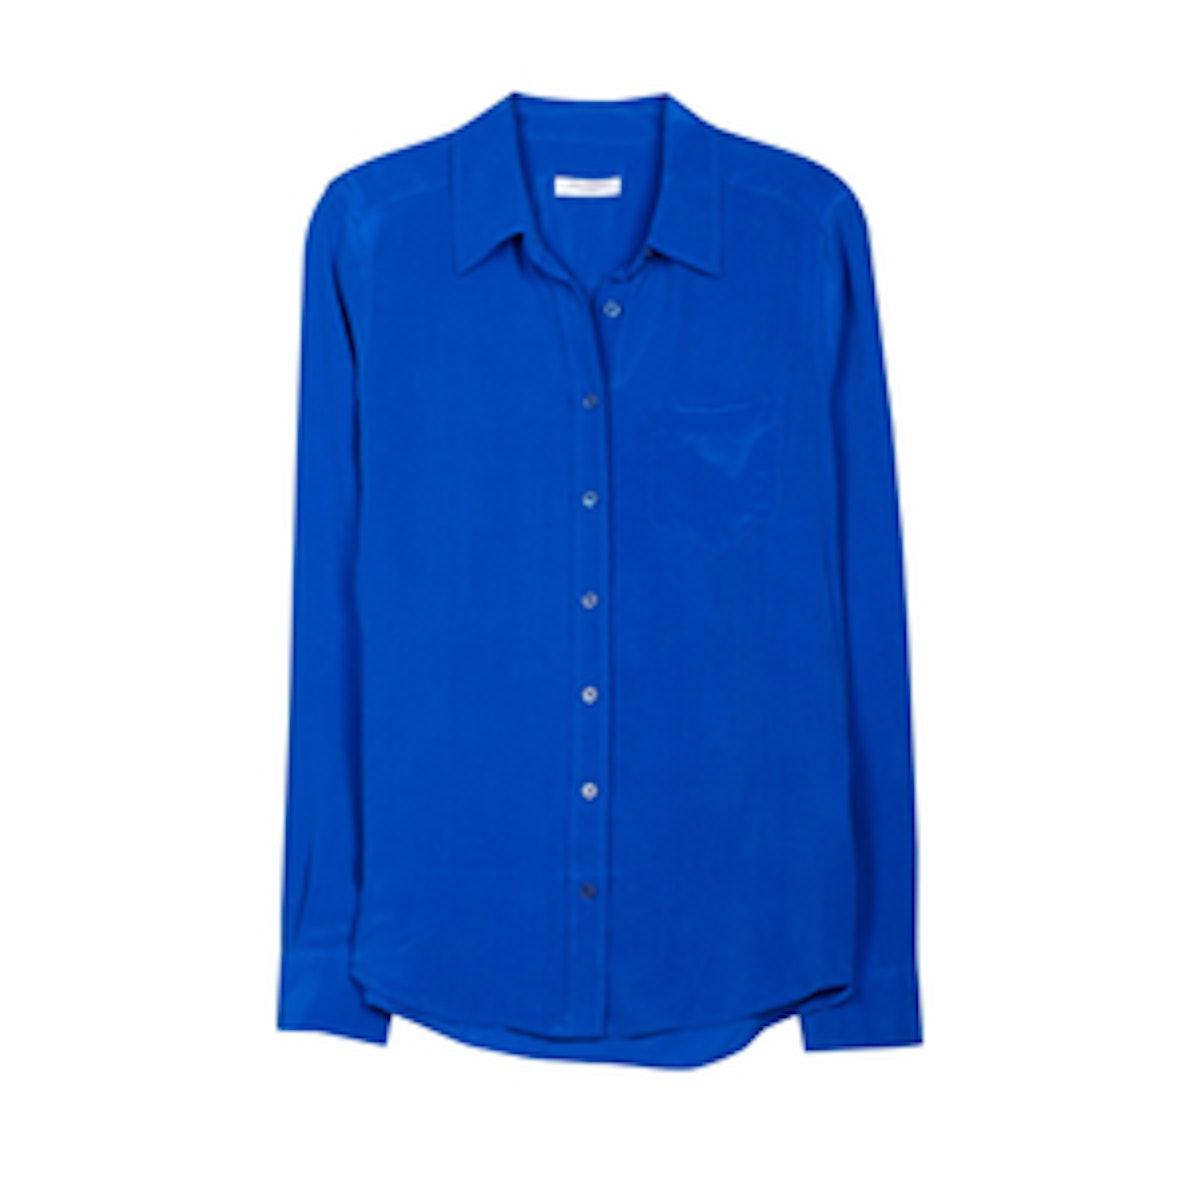 Brett Regal Blue Shirt